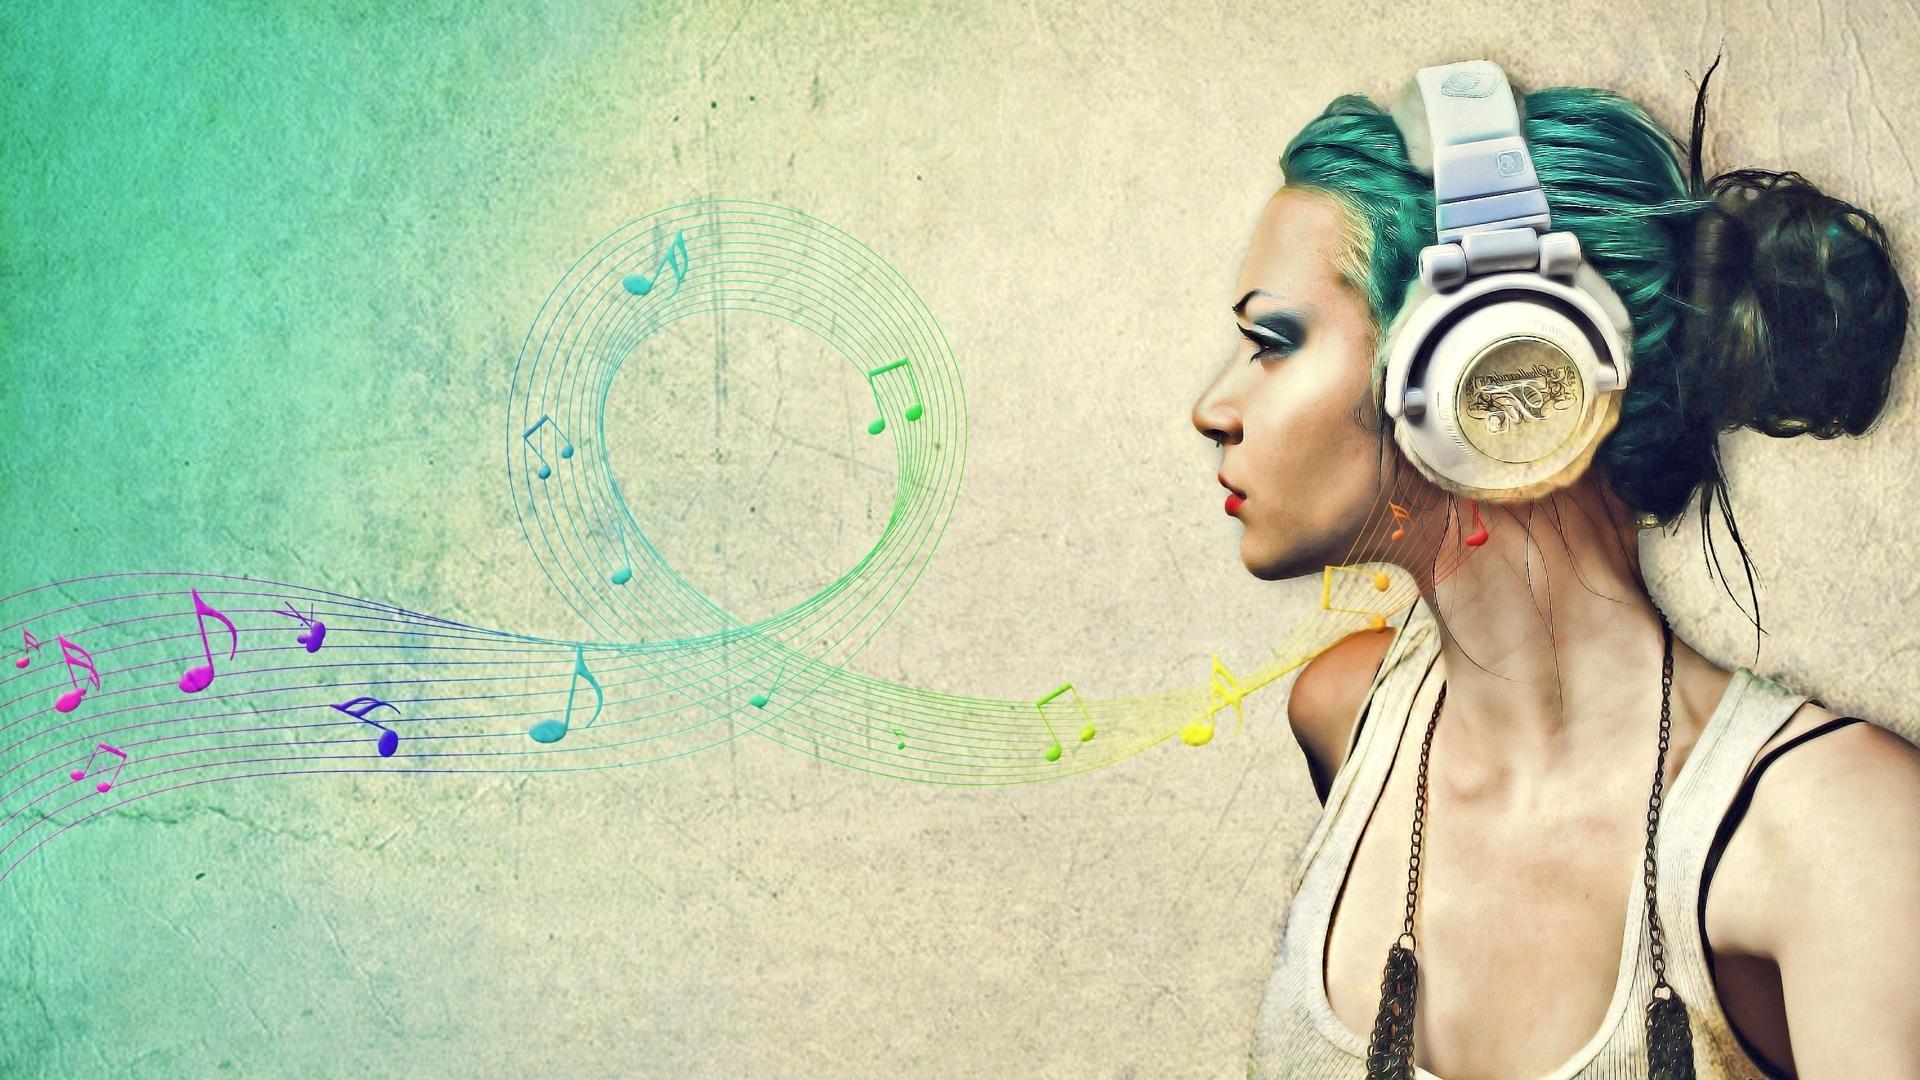 Music Desktop Backgrounds – Wallpaper, High Definition, High Quality .